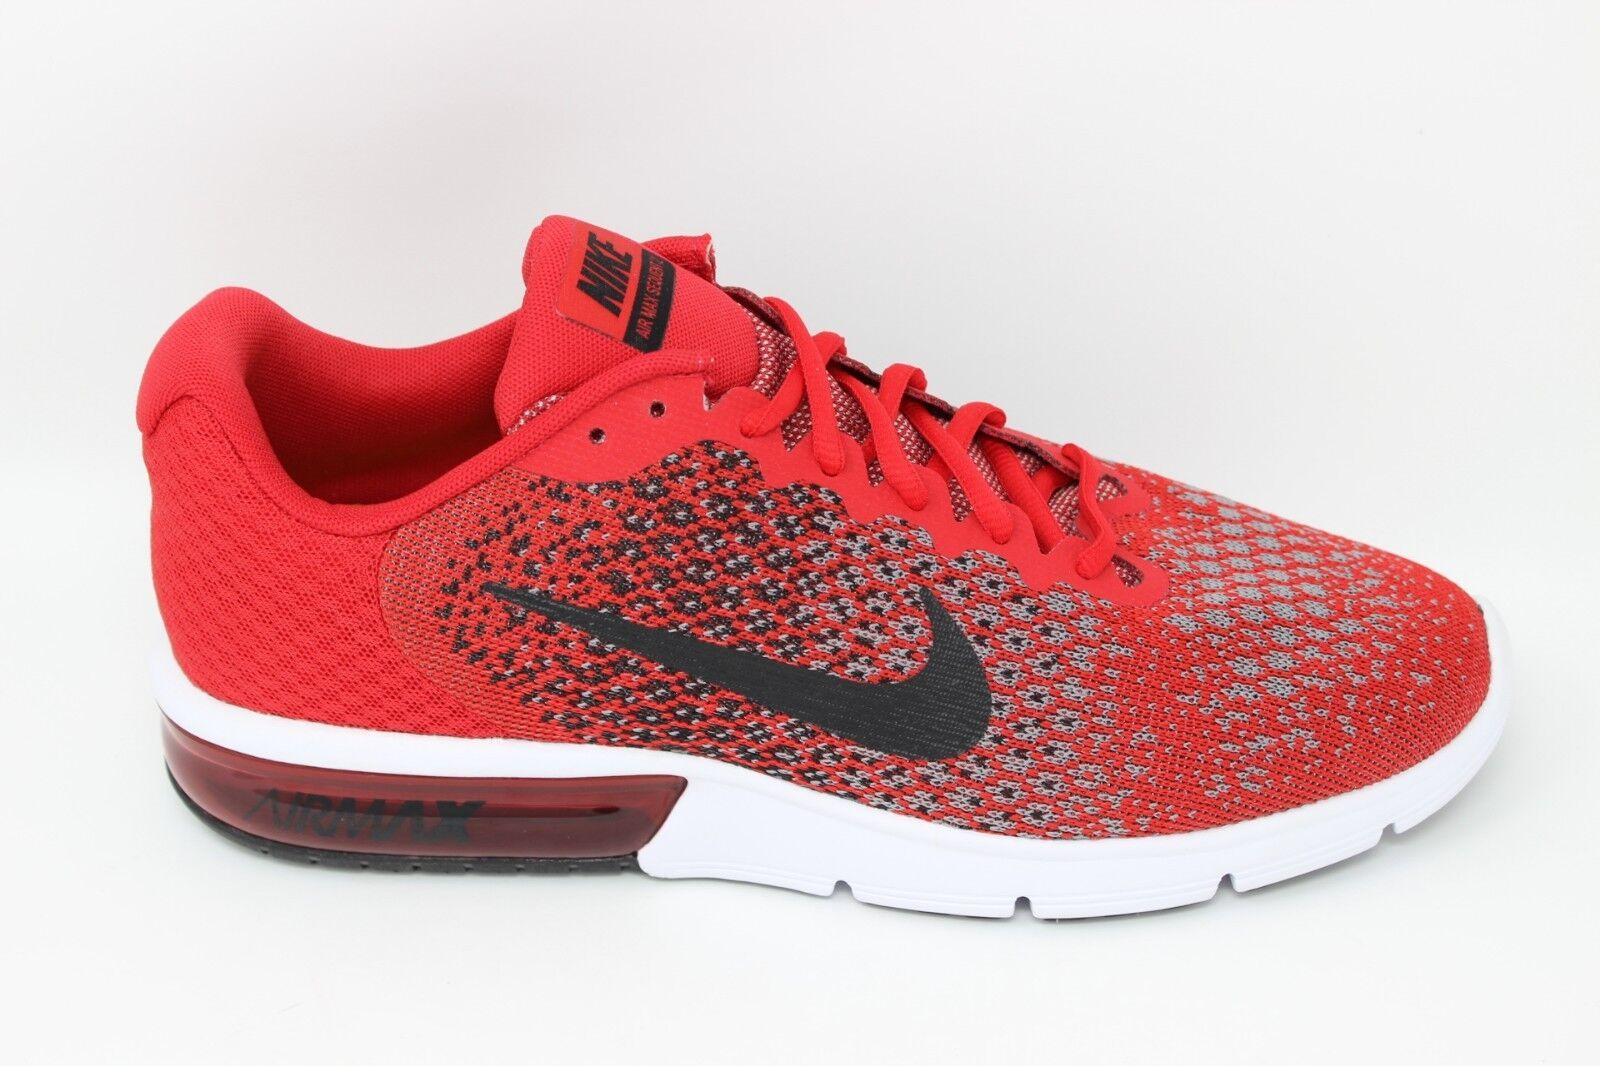 Nike air max 1 600 weitere 852461 universität rot / neu schwarz / schwarz neu / 1e4634